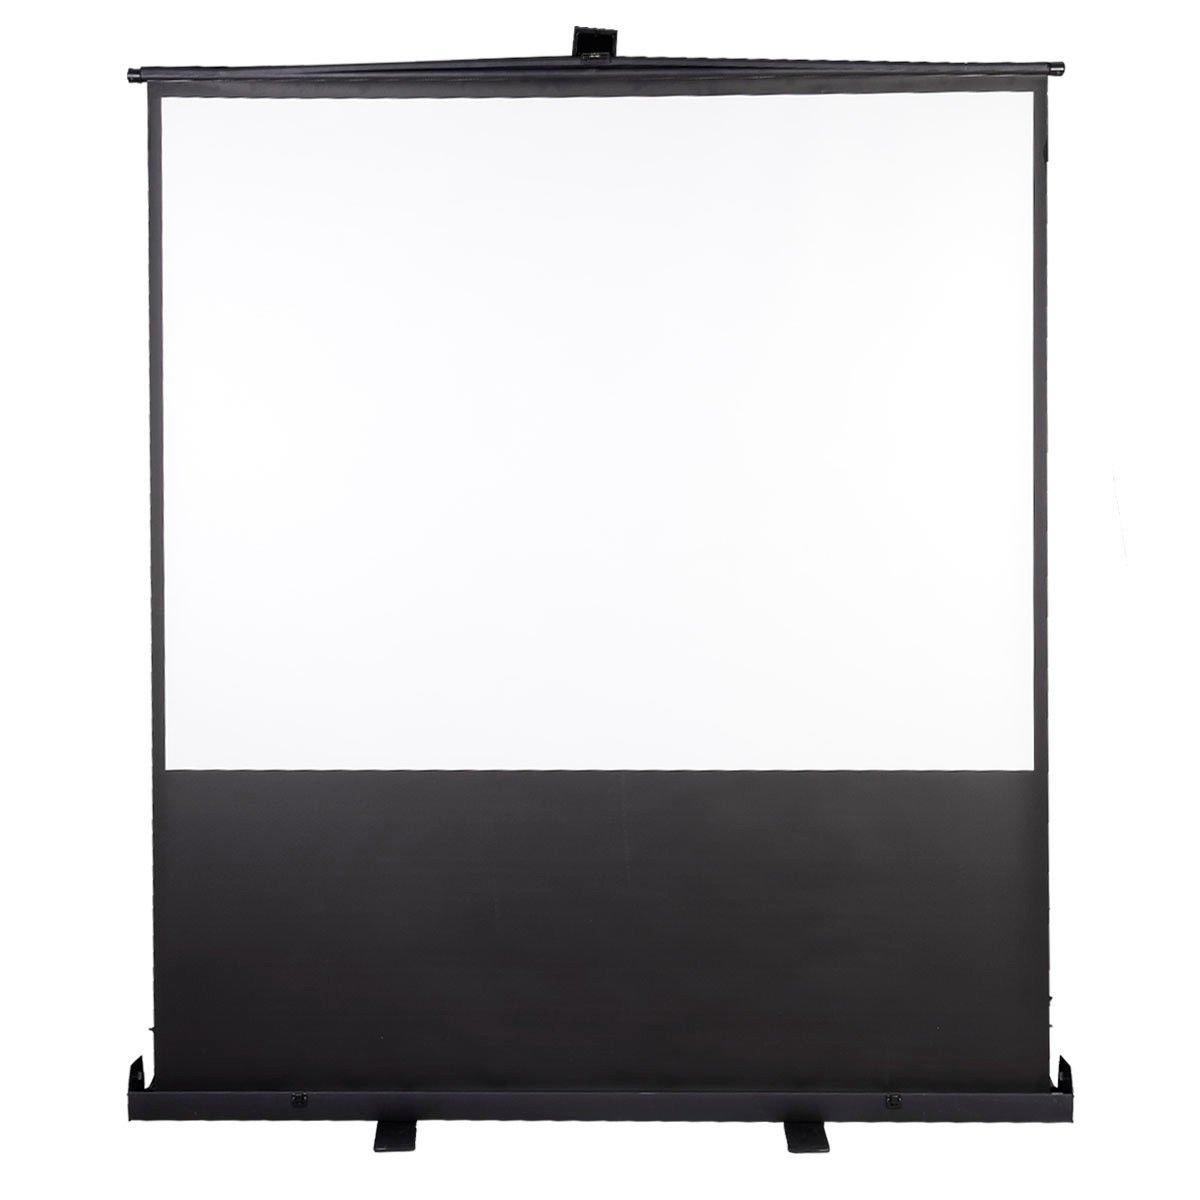 Safeplusポータブル手動Pull Up床スタンドプロジェクター投影画面 100-inch Diagonal / 4:3 100-inch Diagonal / 4:3  B01AKXRM7A